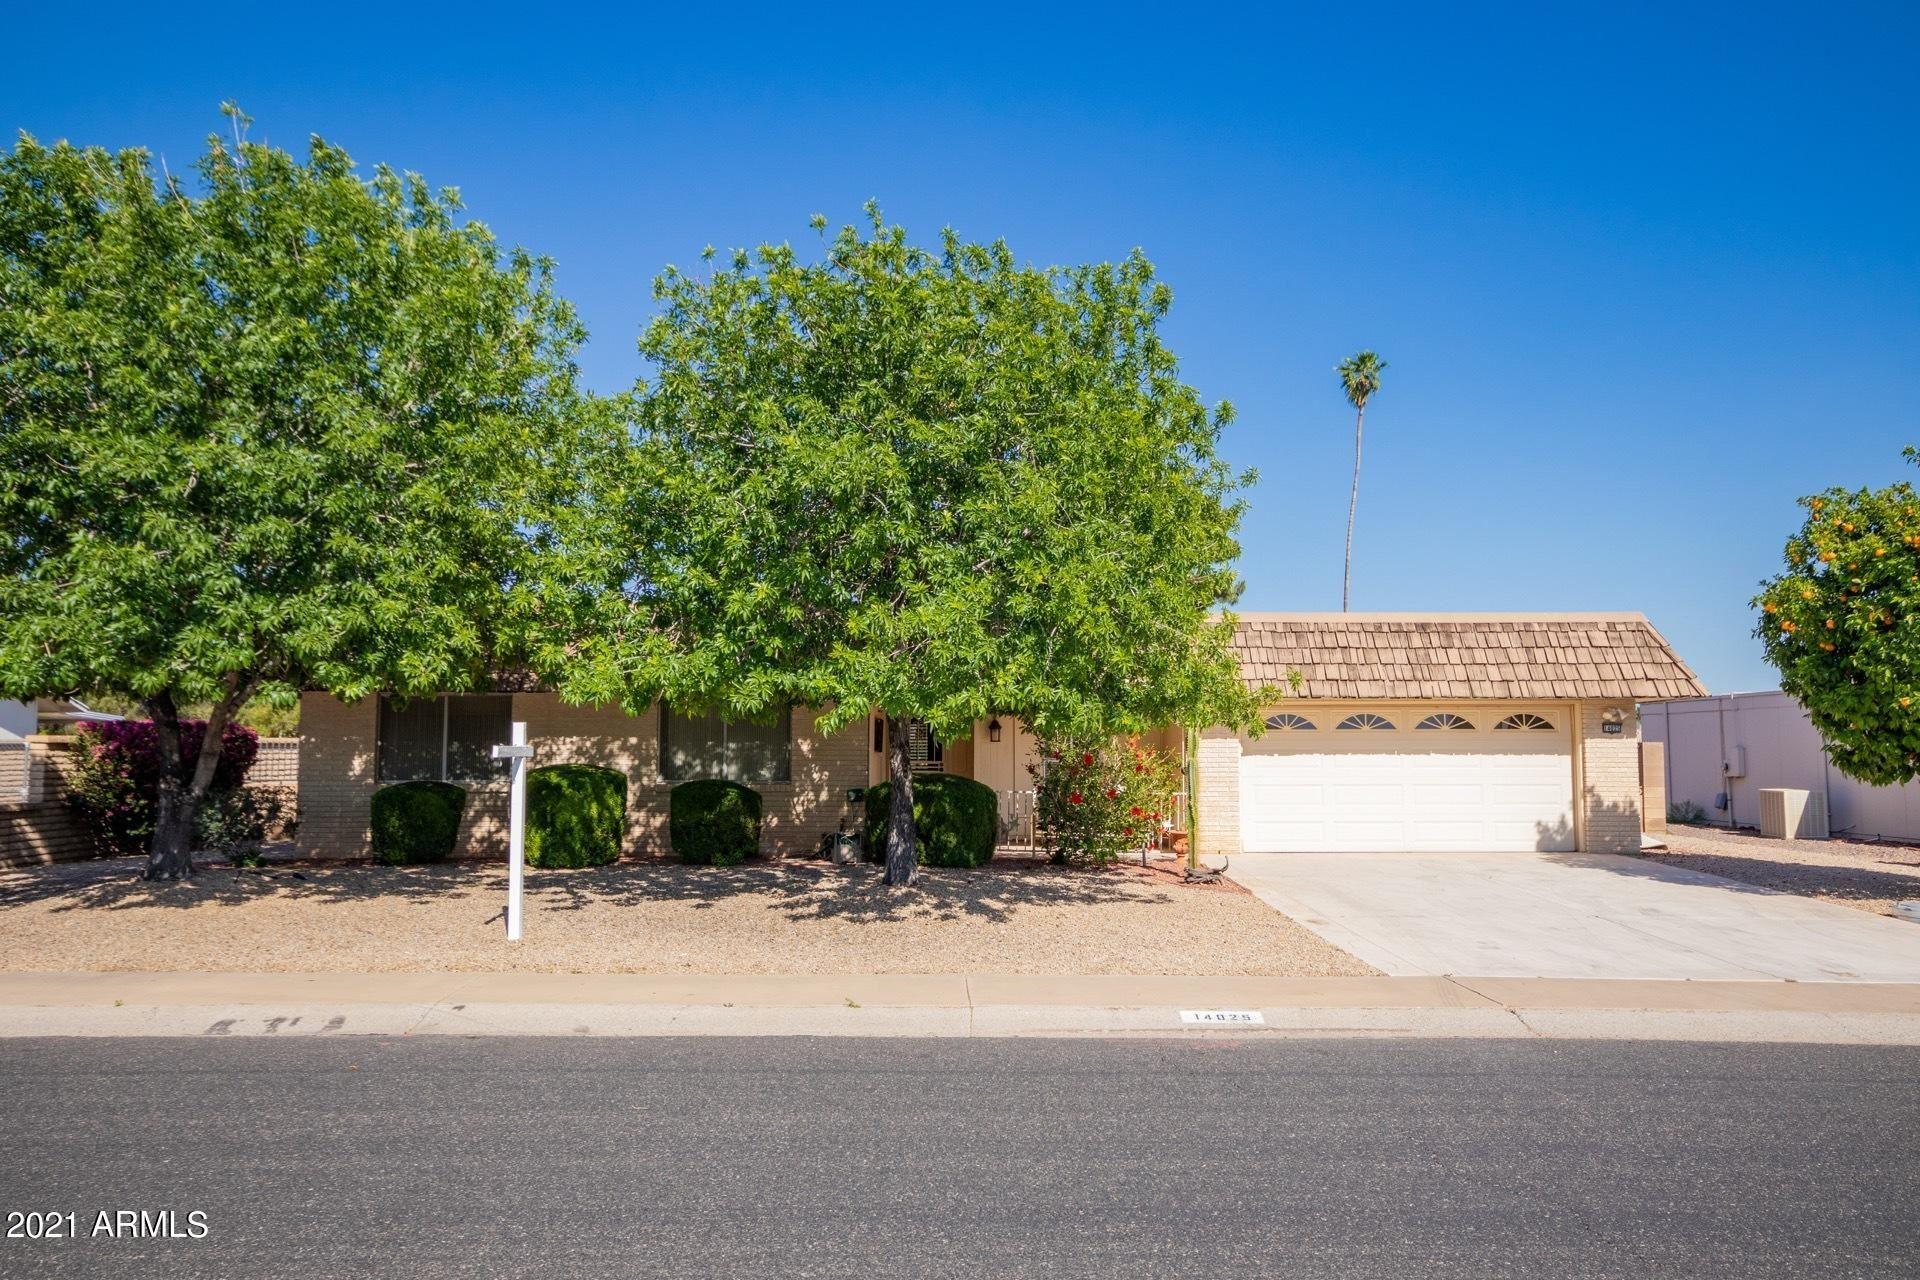 14025 N LAKEFOREST Drive, Sun City, AZ 85351 - MLS#: 6224582